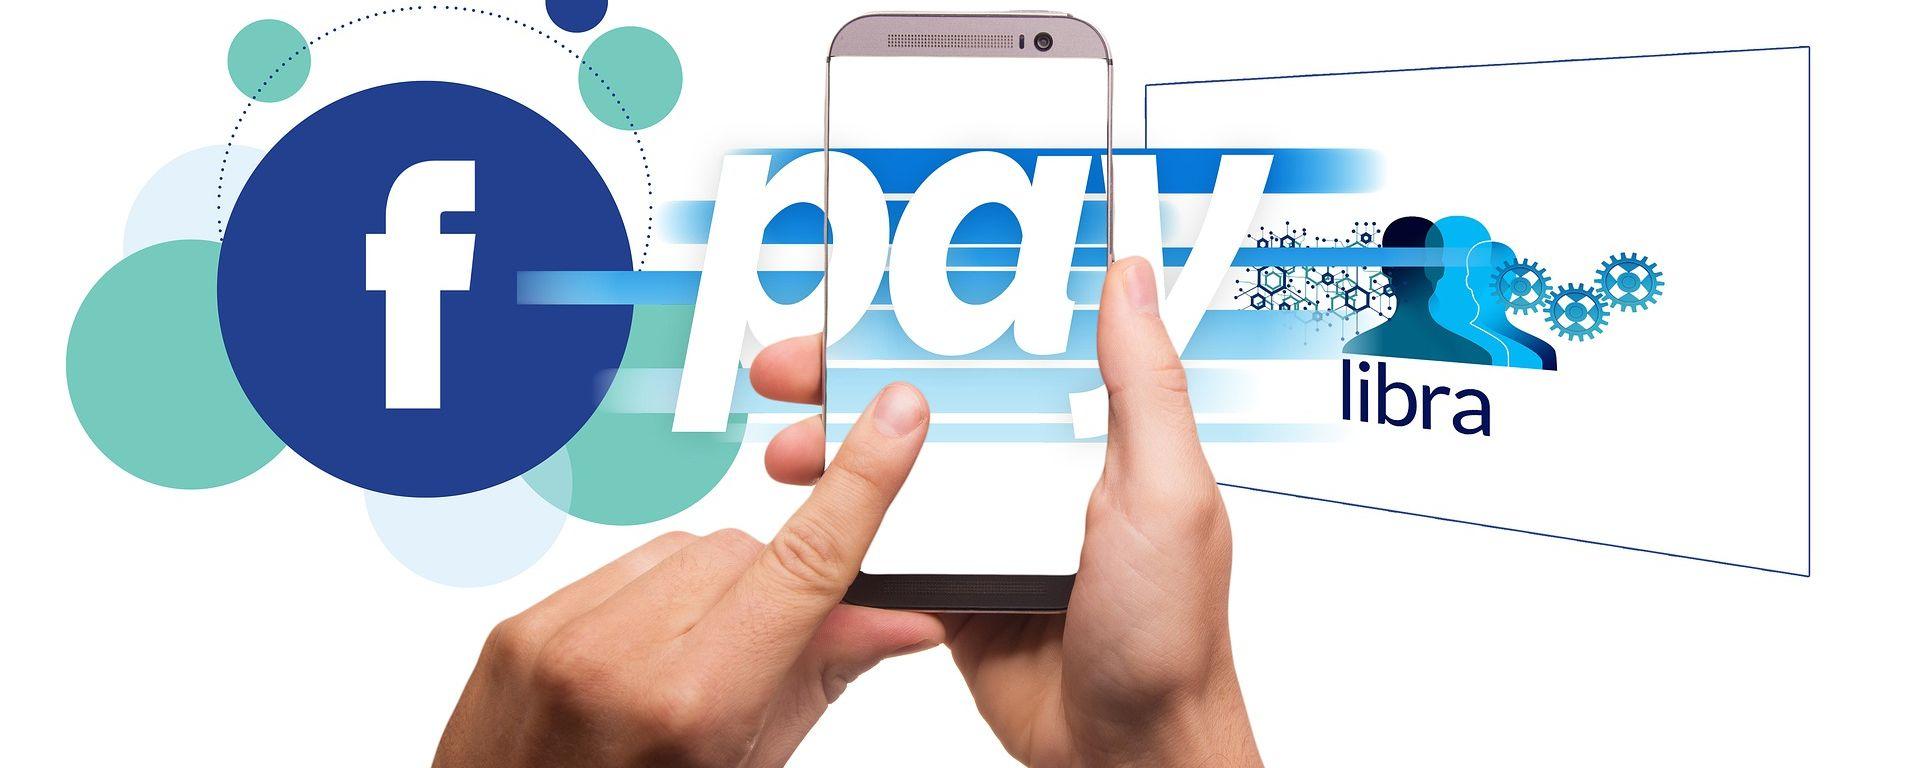 Kostenloser Online-Vortrag: Mobile Payment - Sicher mobil bezahlen am 26. April